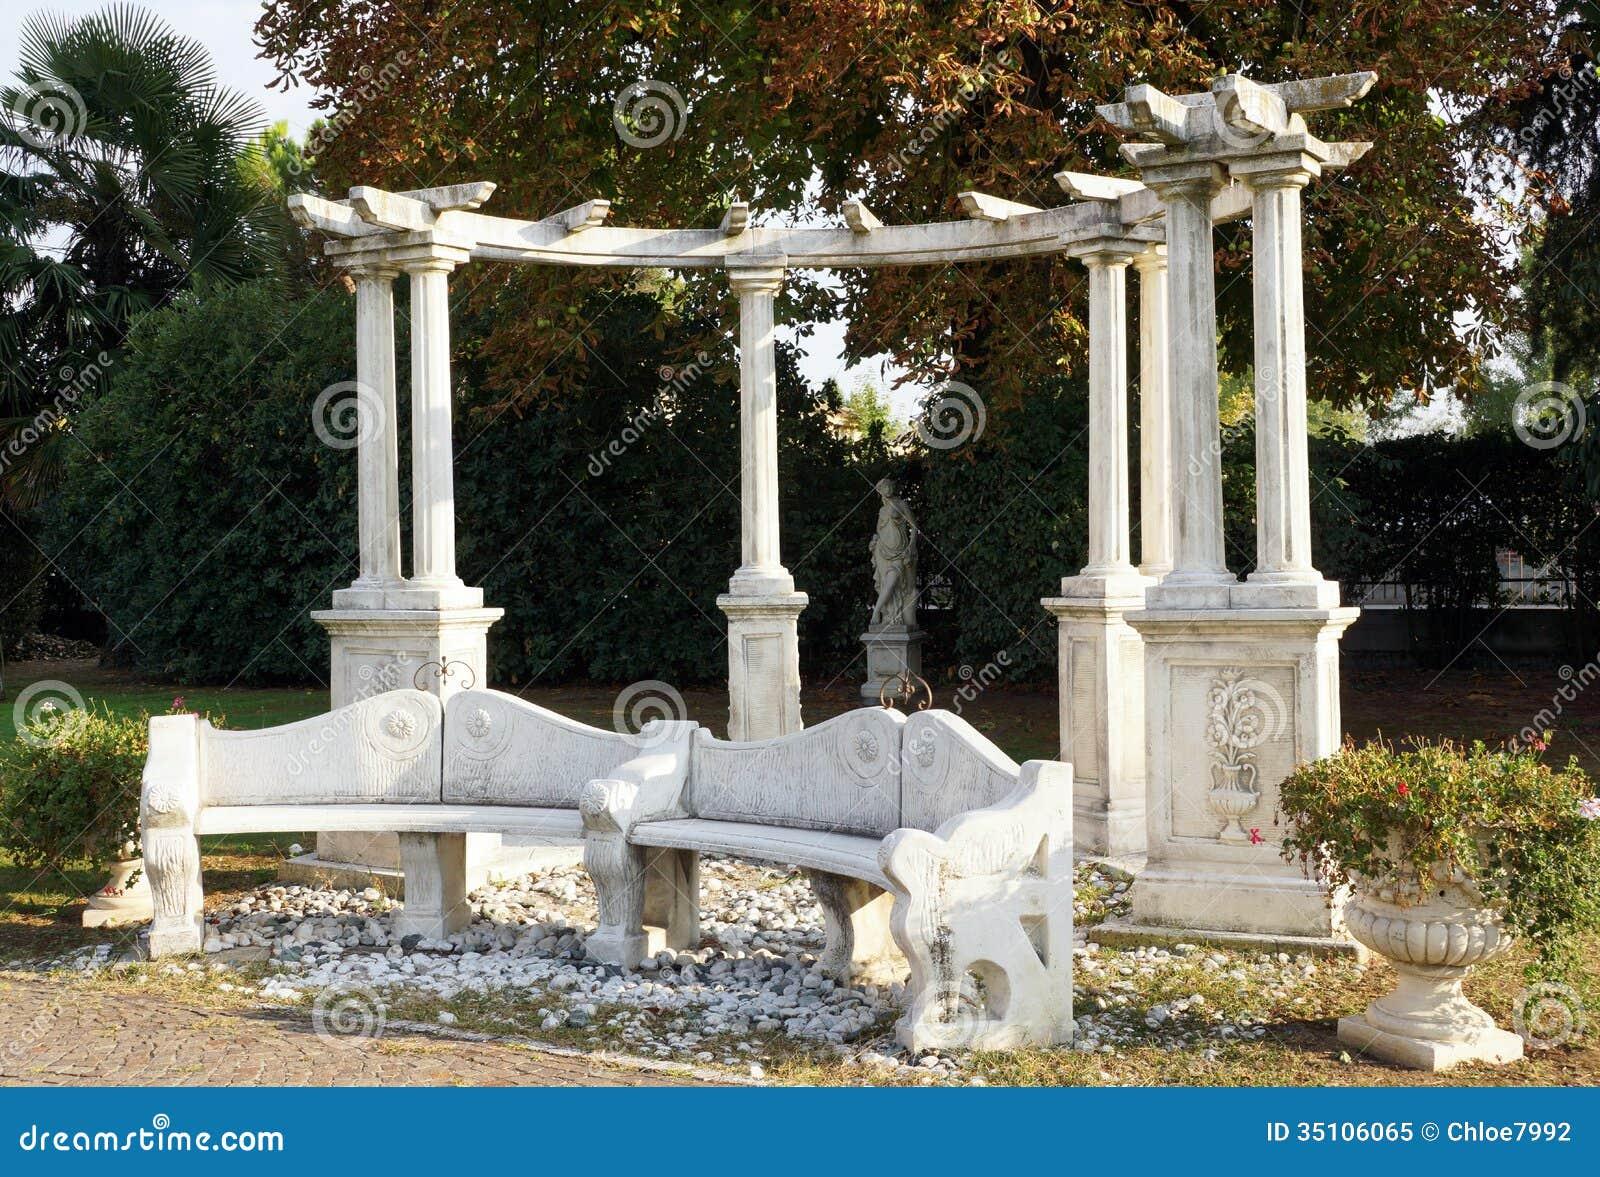 Mediterranean Garden Royalty Free Stock Photo Image 35106065